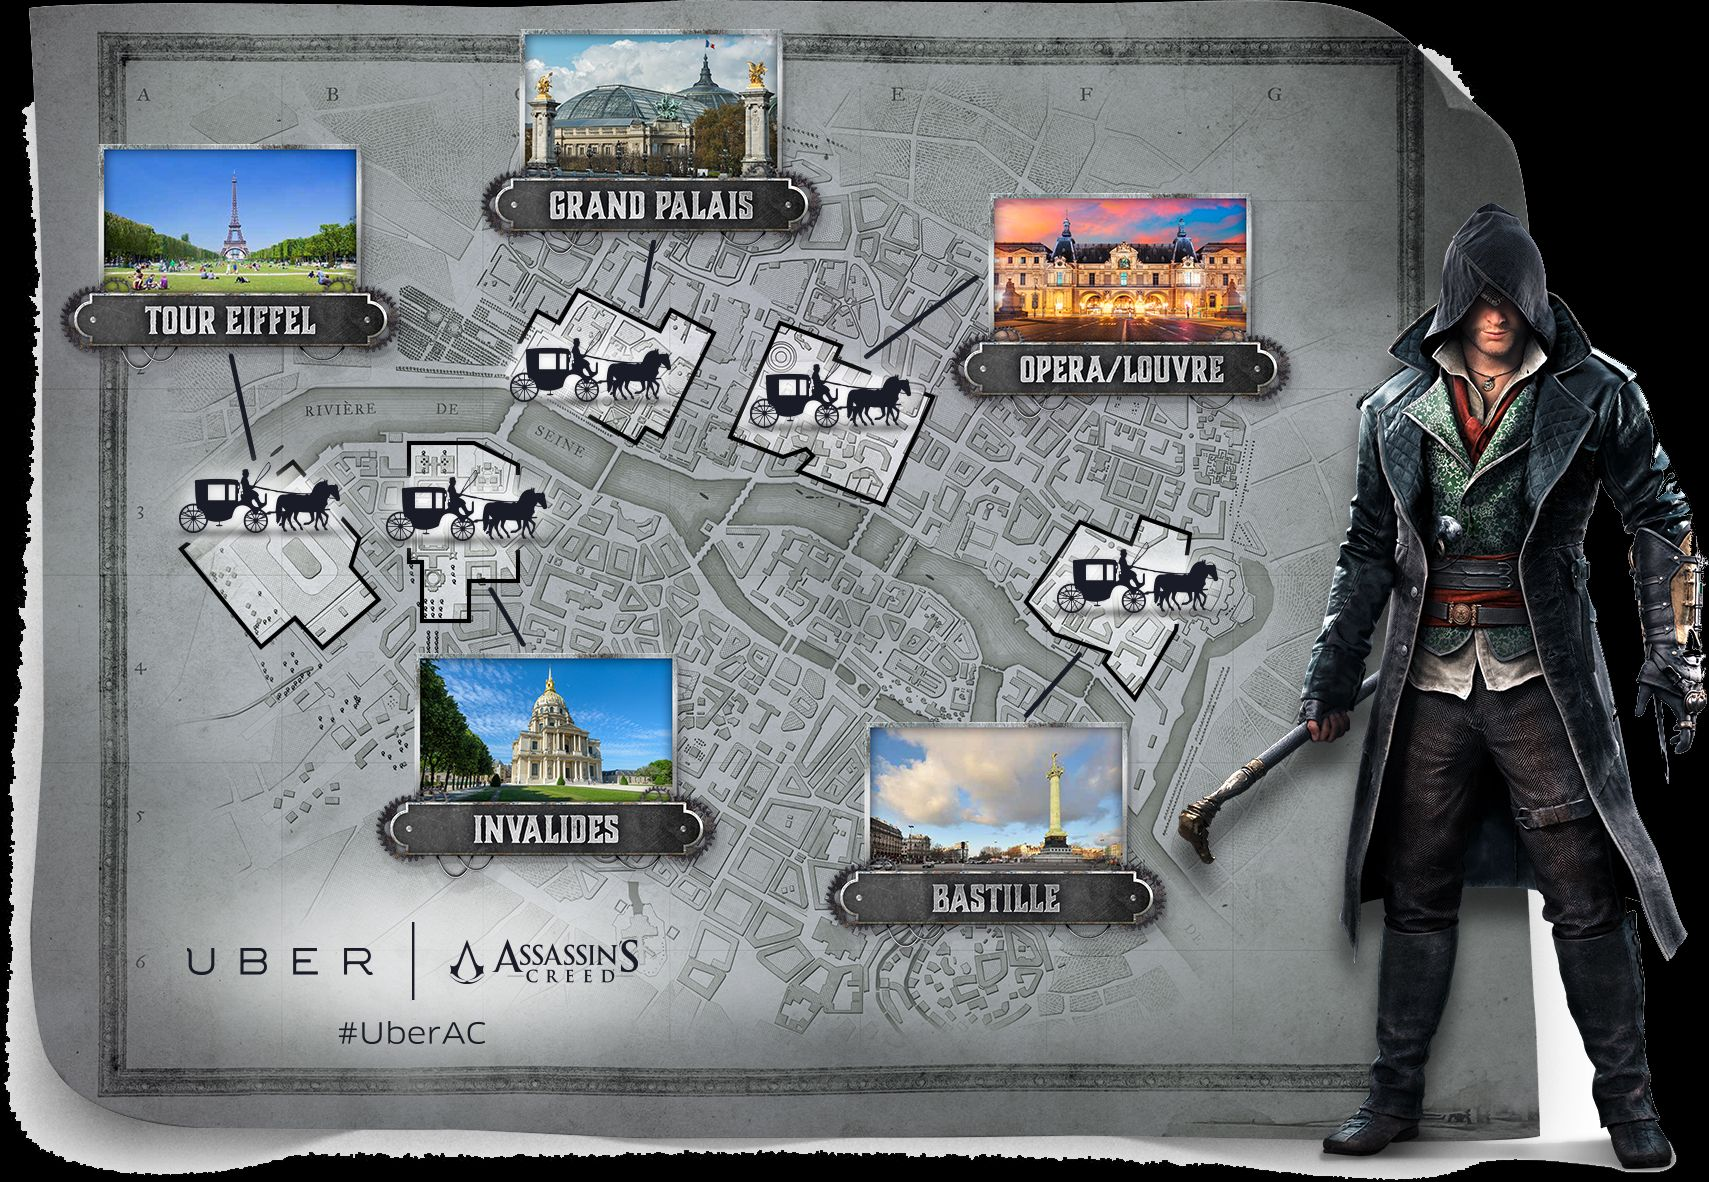 Assassin Creed Uber